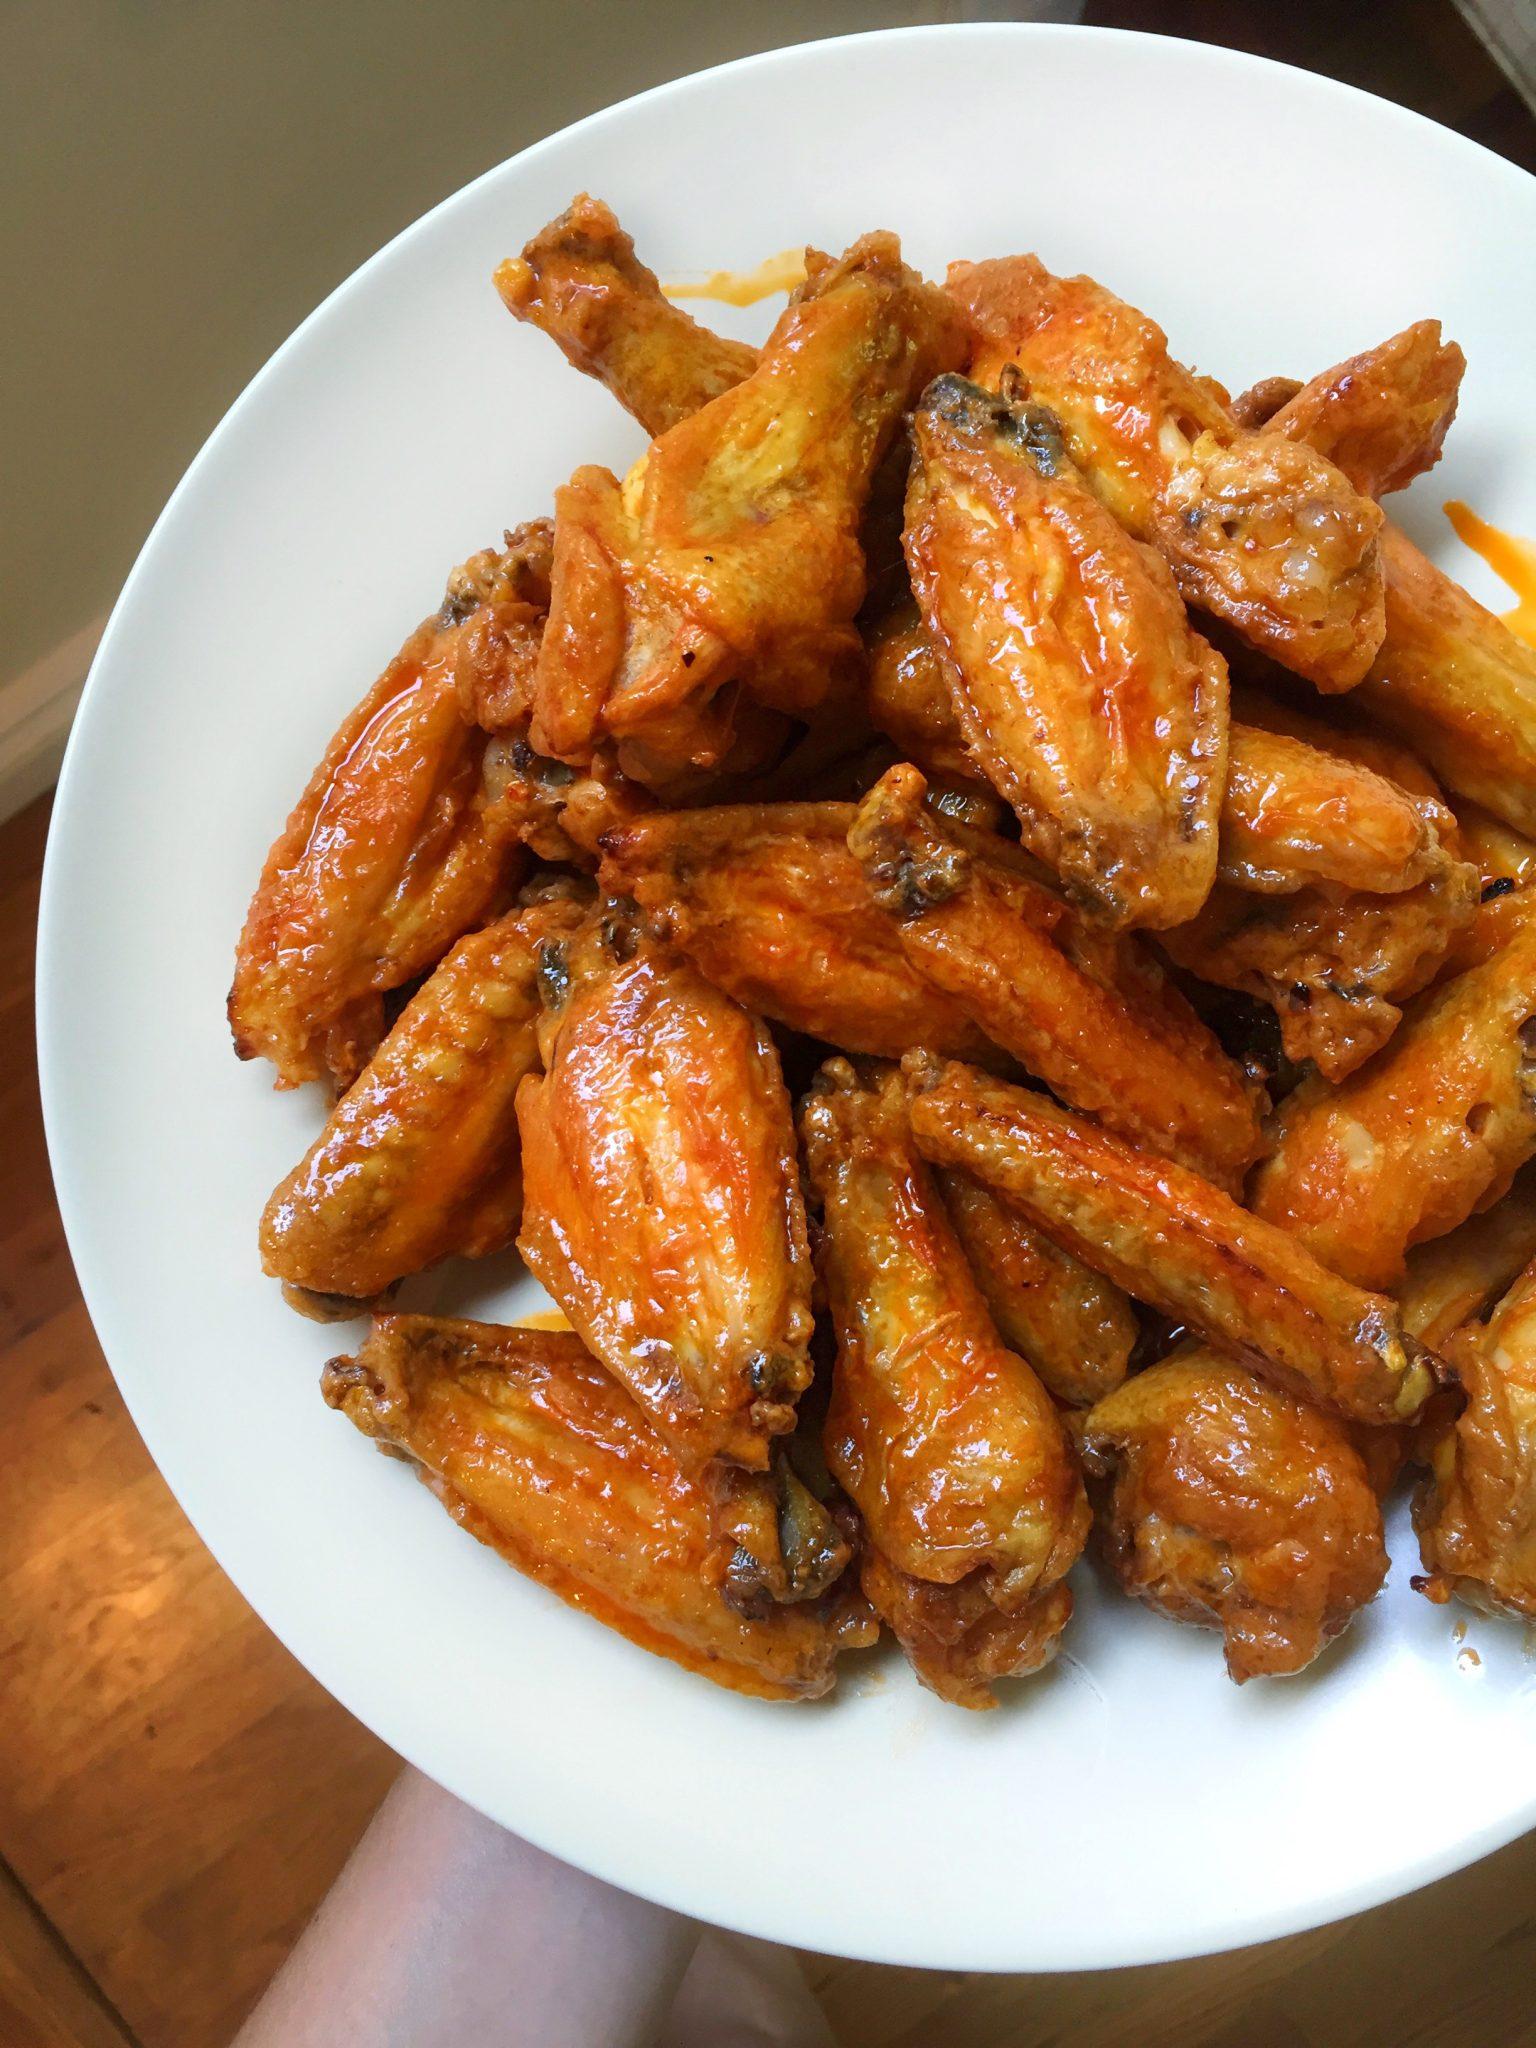 Football Snacks: Boiled & Broiled Buffalo Wings | The Skinny Pig